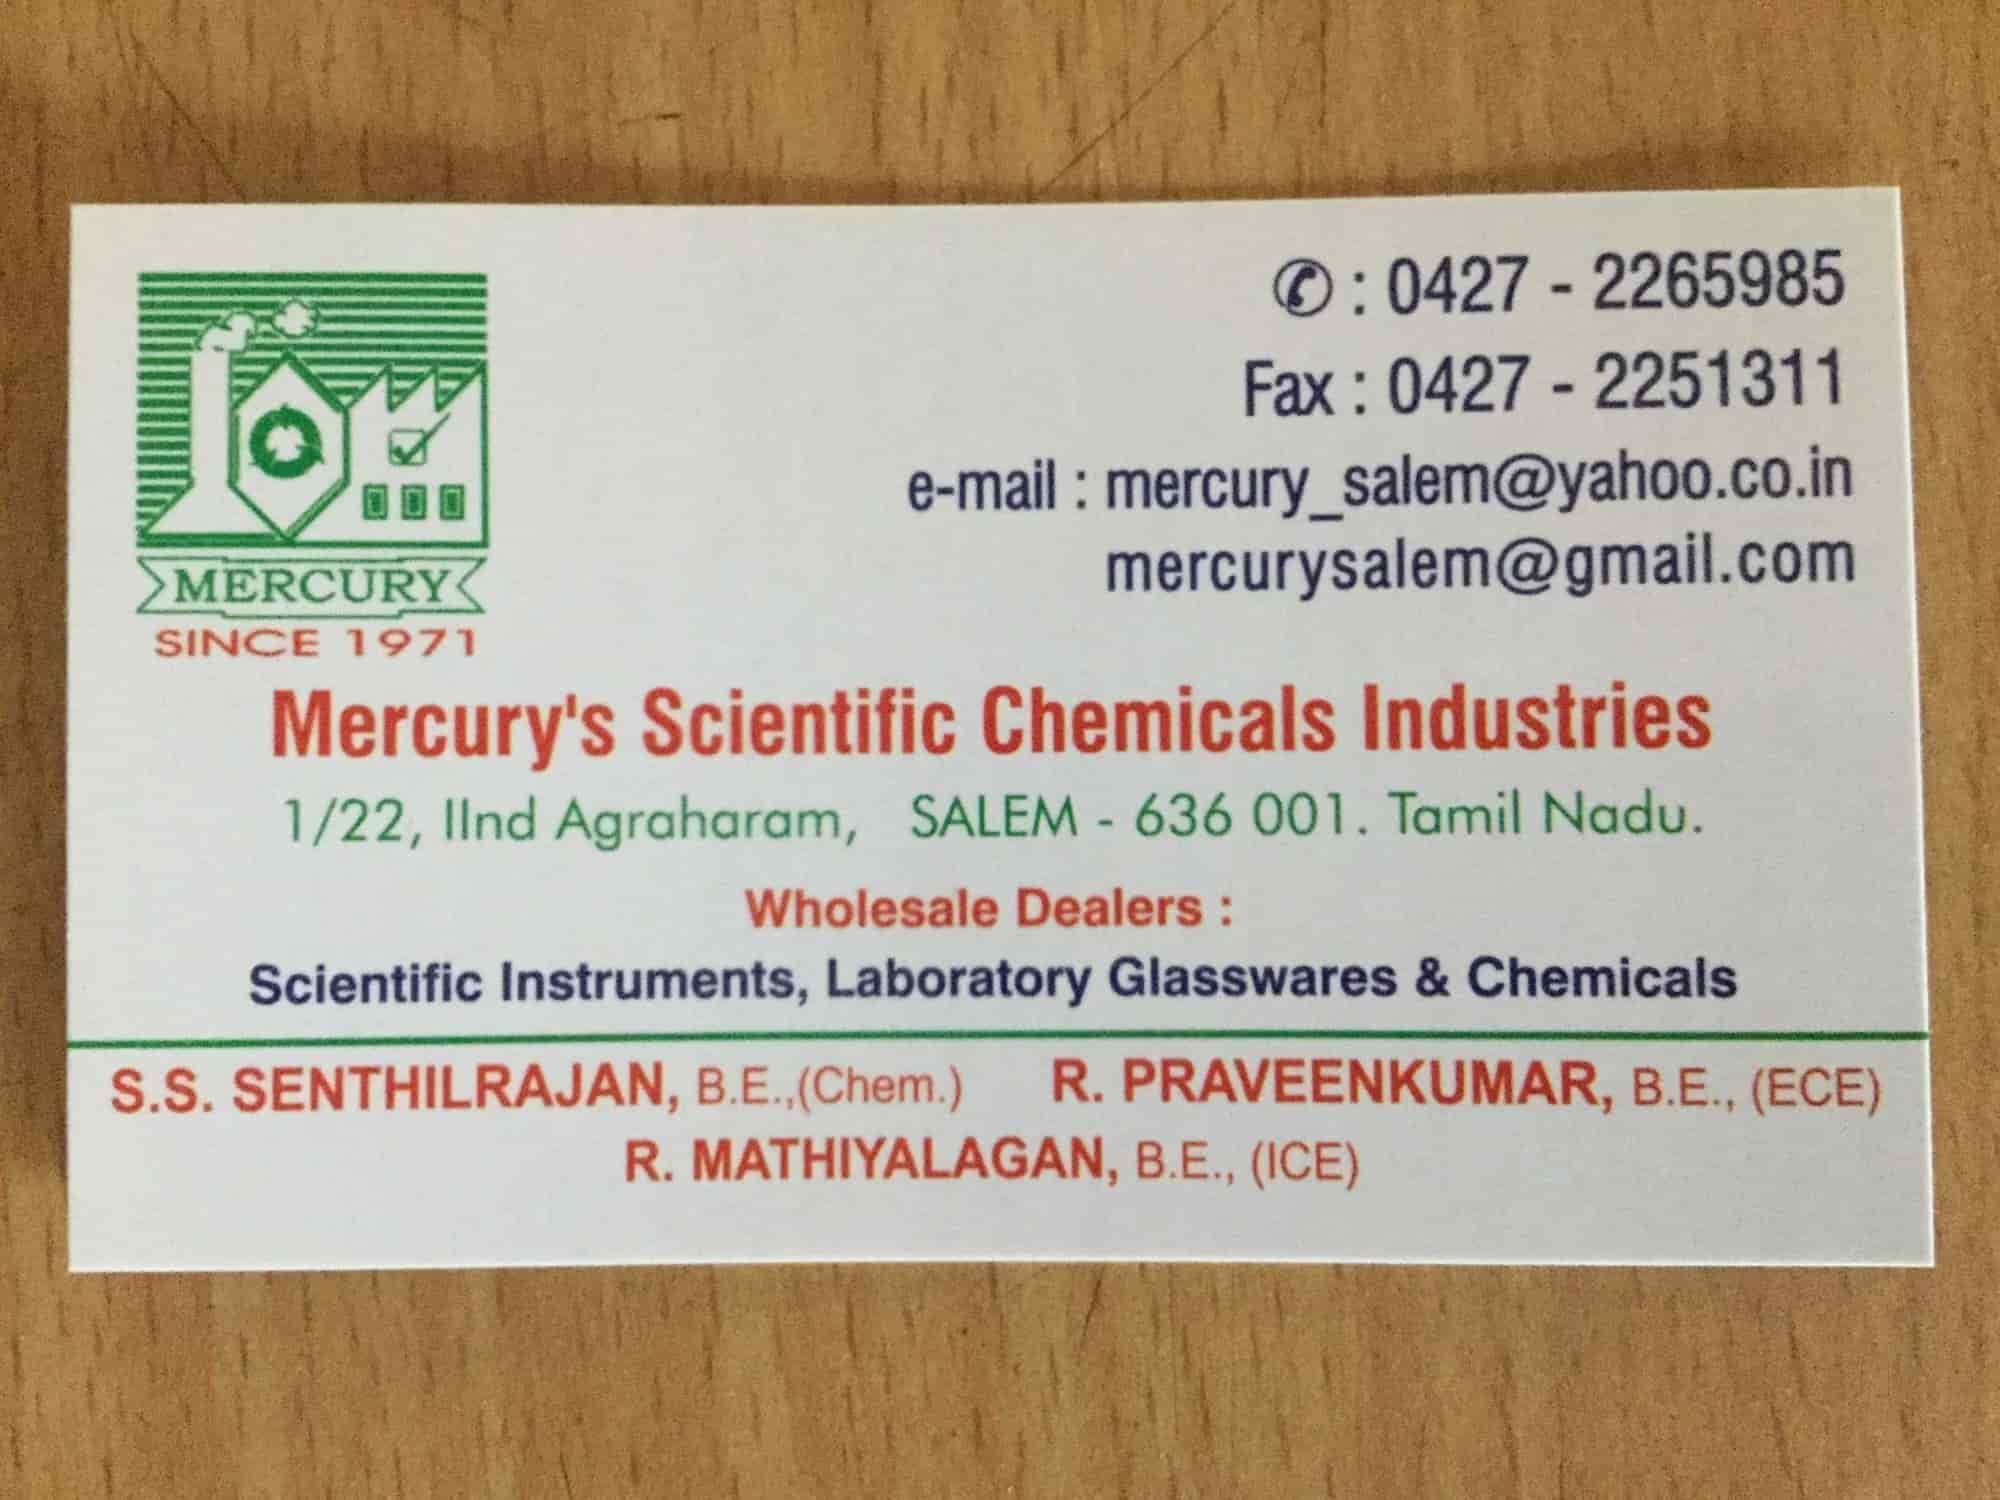 Mercury's Scientific Chemicals Industries, Salem Ho - Laboratory